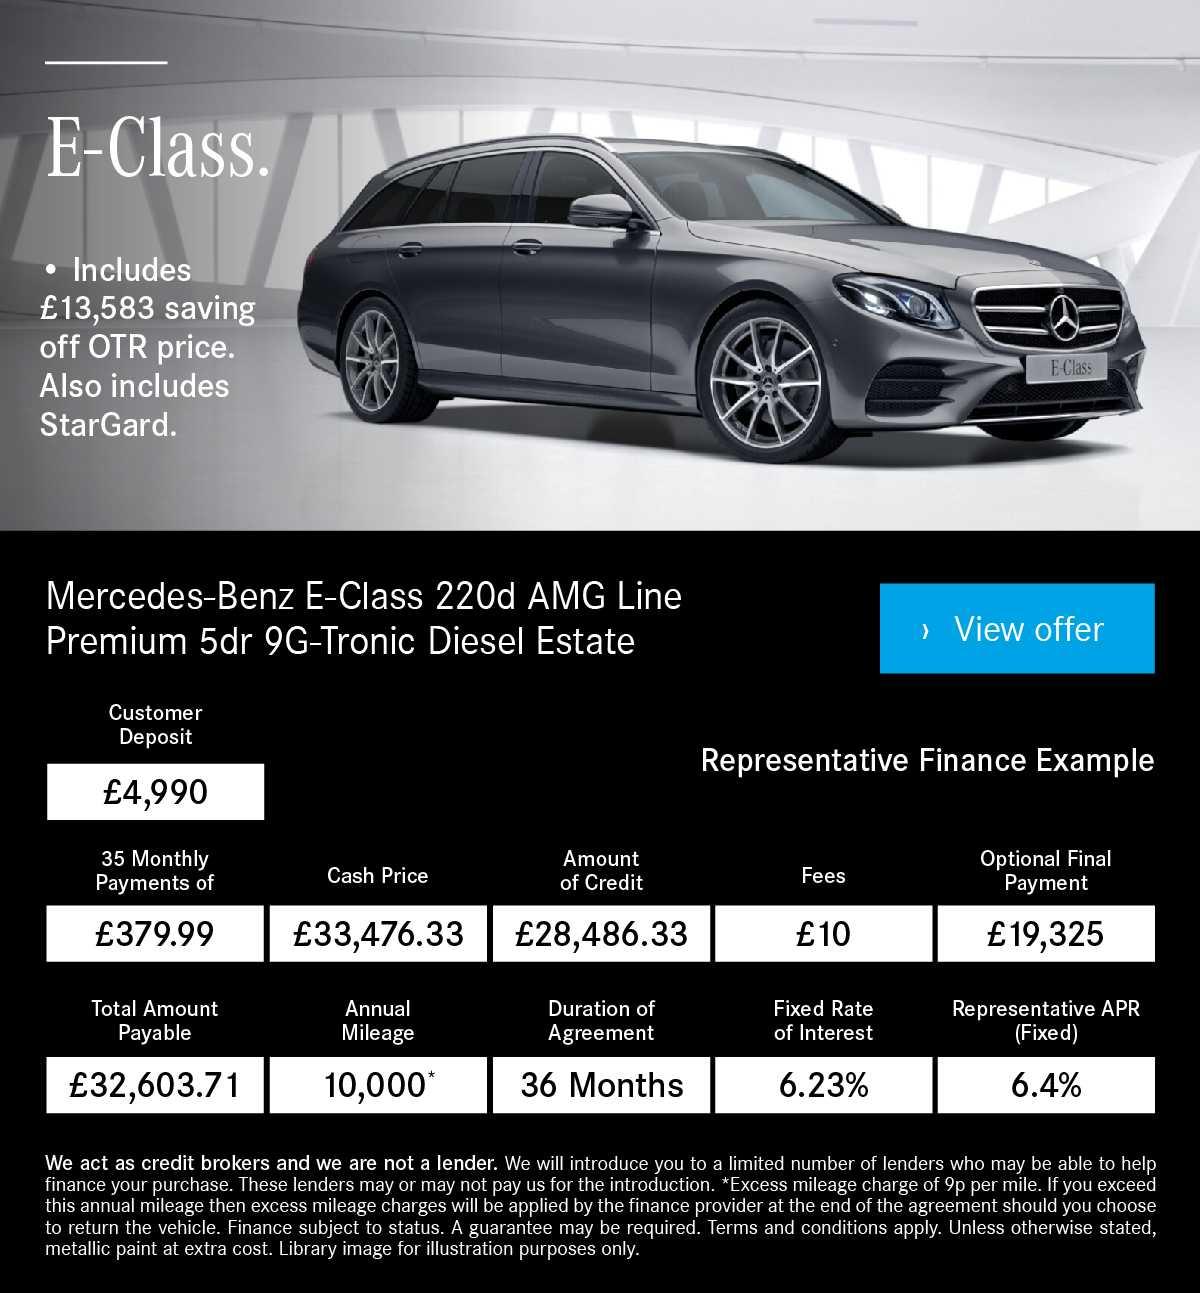 Mercedes-Benz of Slough   Mercedes-Benz and smart Retailer